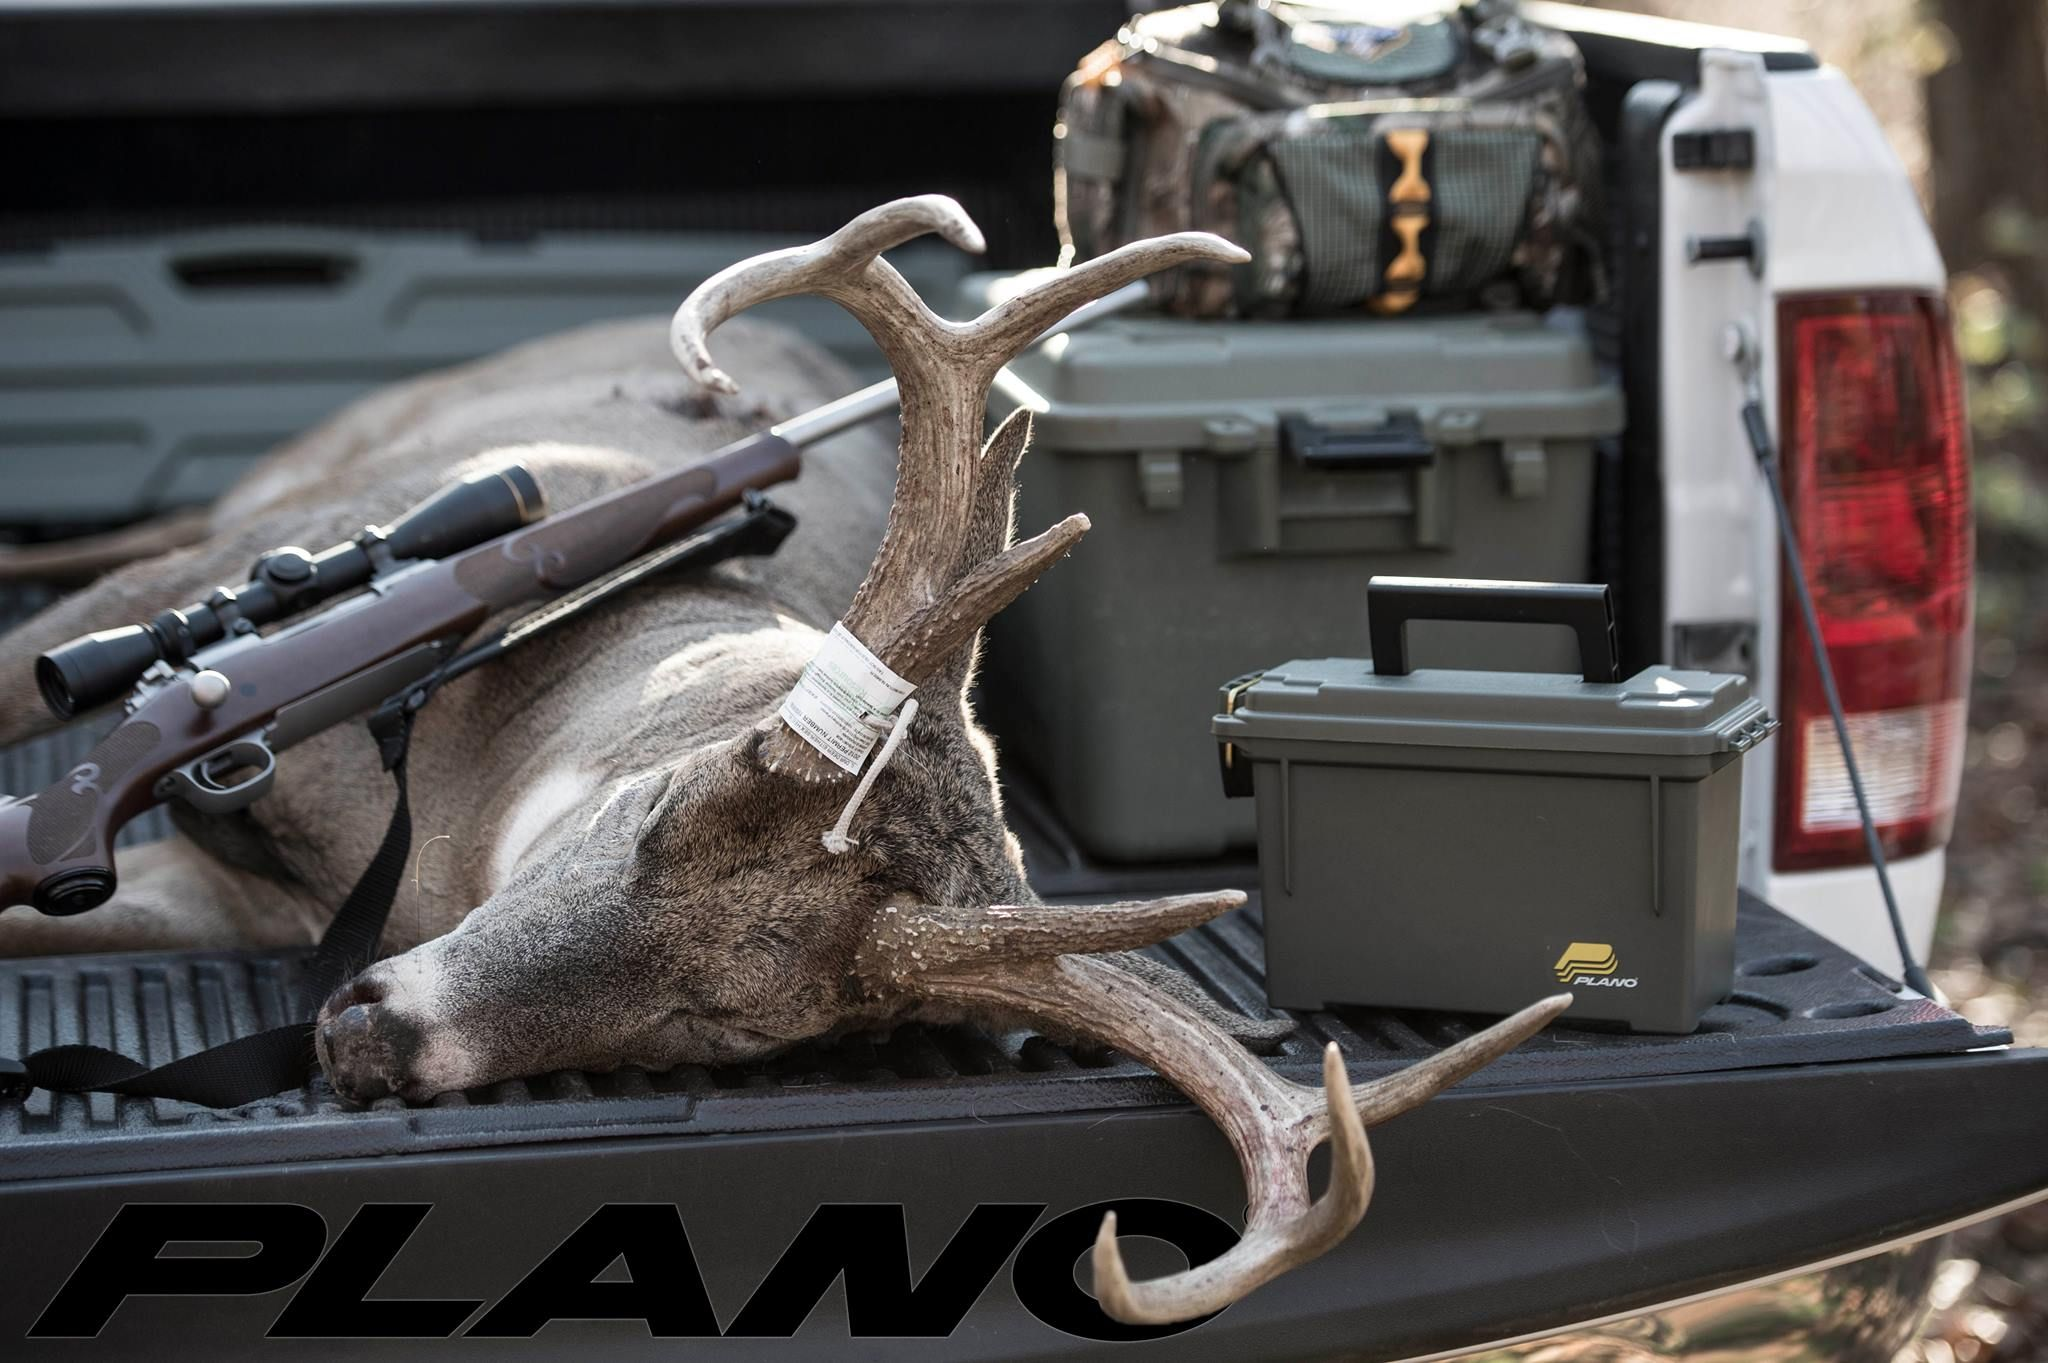 Plano Sports & Outdoors Gun Storage 1312 Ammo Can - Walmart com